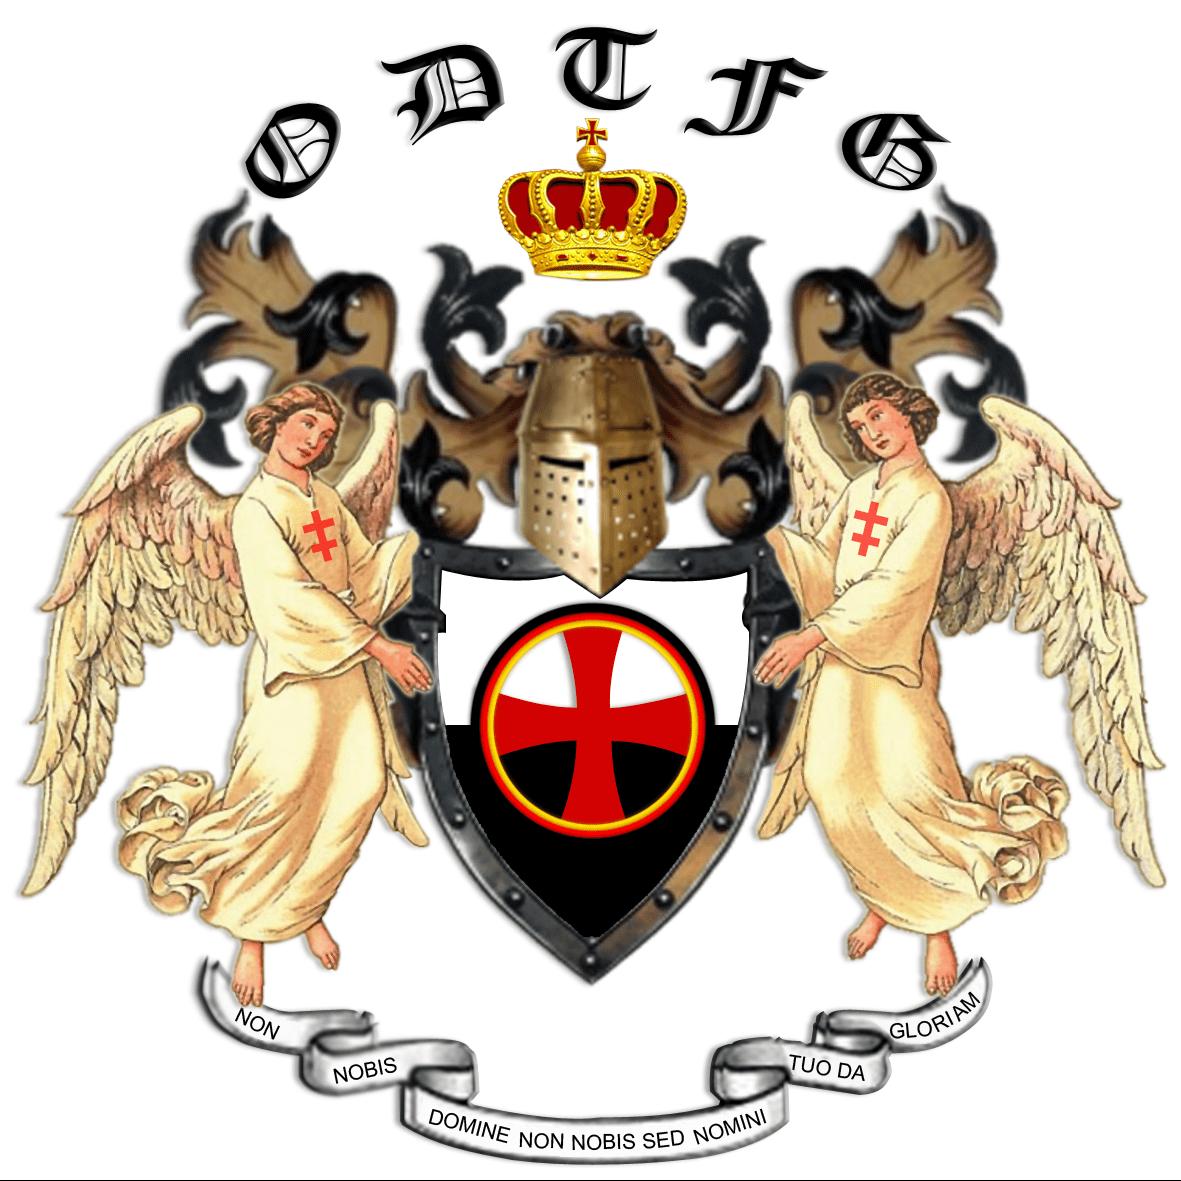 L'Ordre Du Temple Fratrum Germanorum